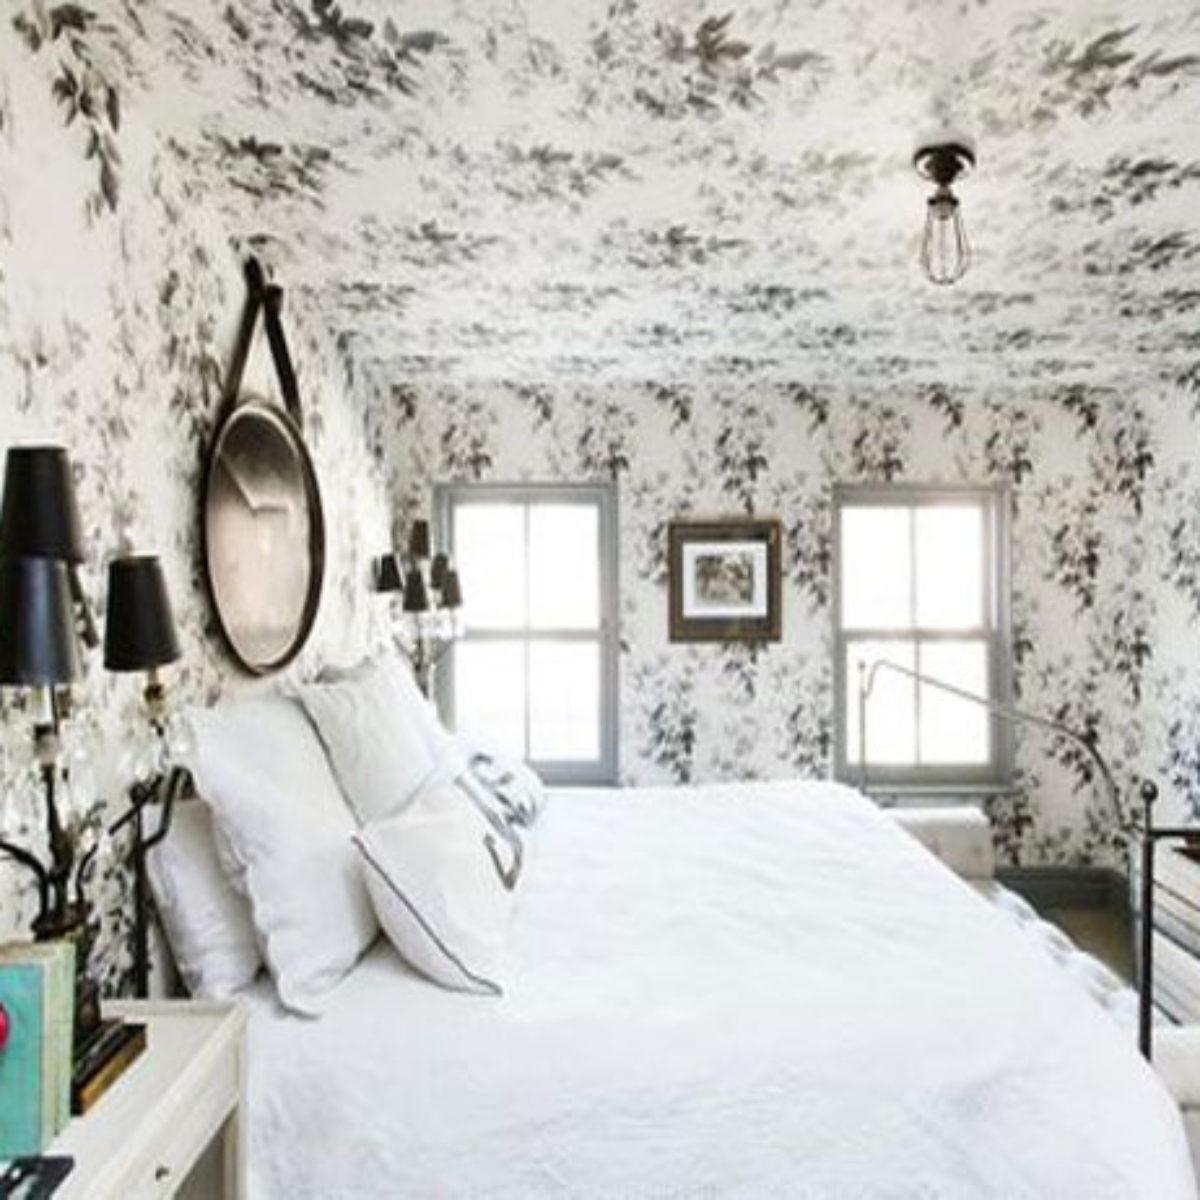 Wallpaper for bedroom walls designs 2019 | Bedroom Wallpaper ...